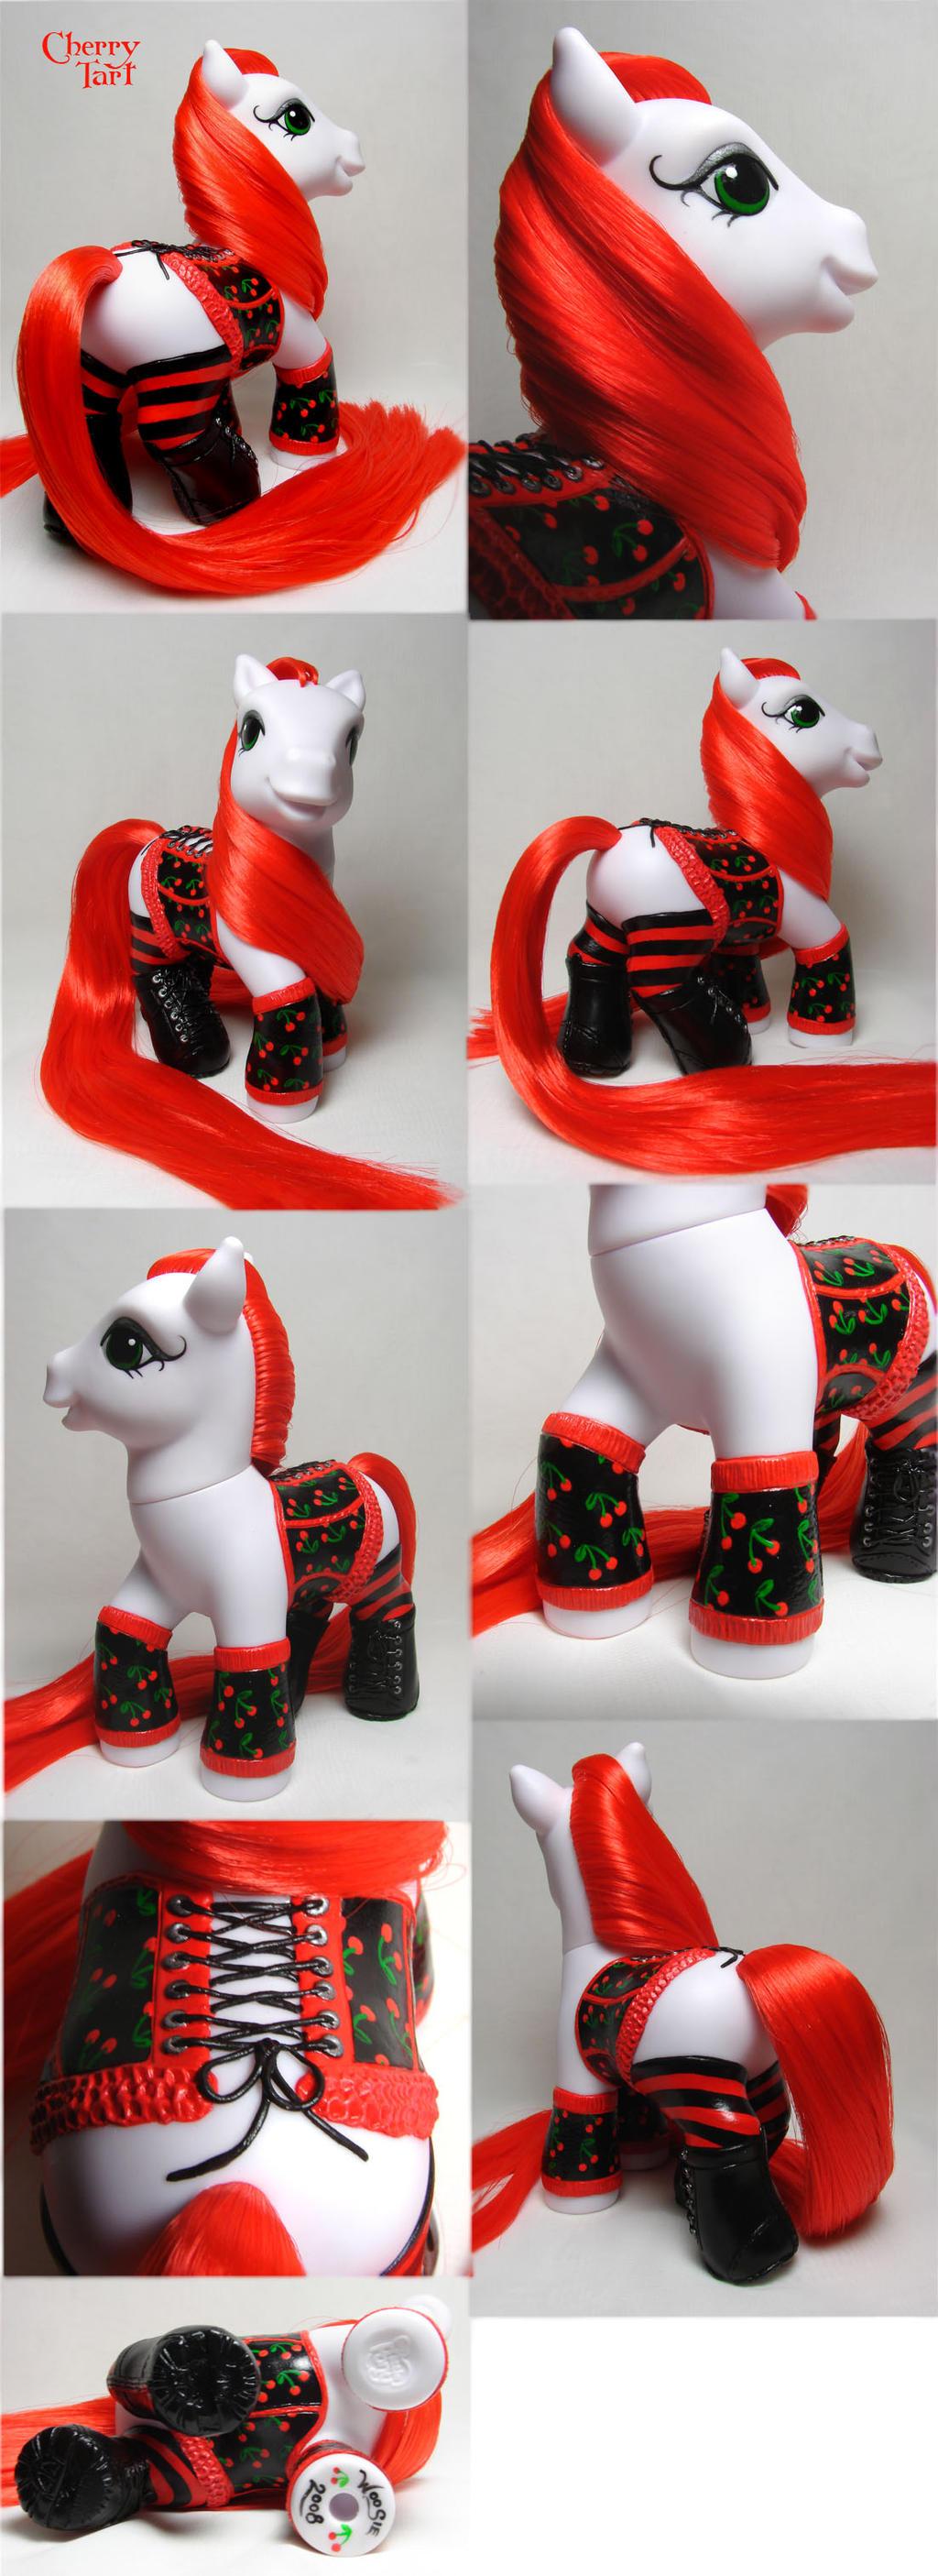 Cherry Tart corset pony by Woosie